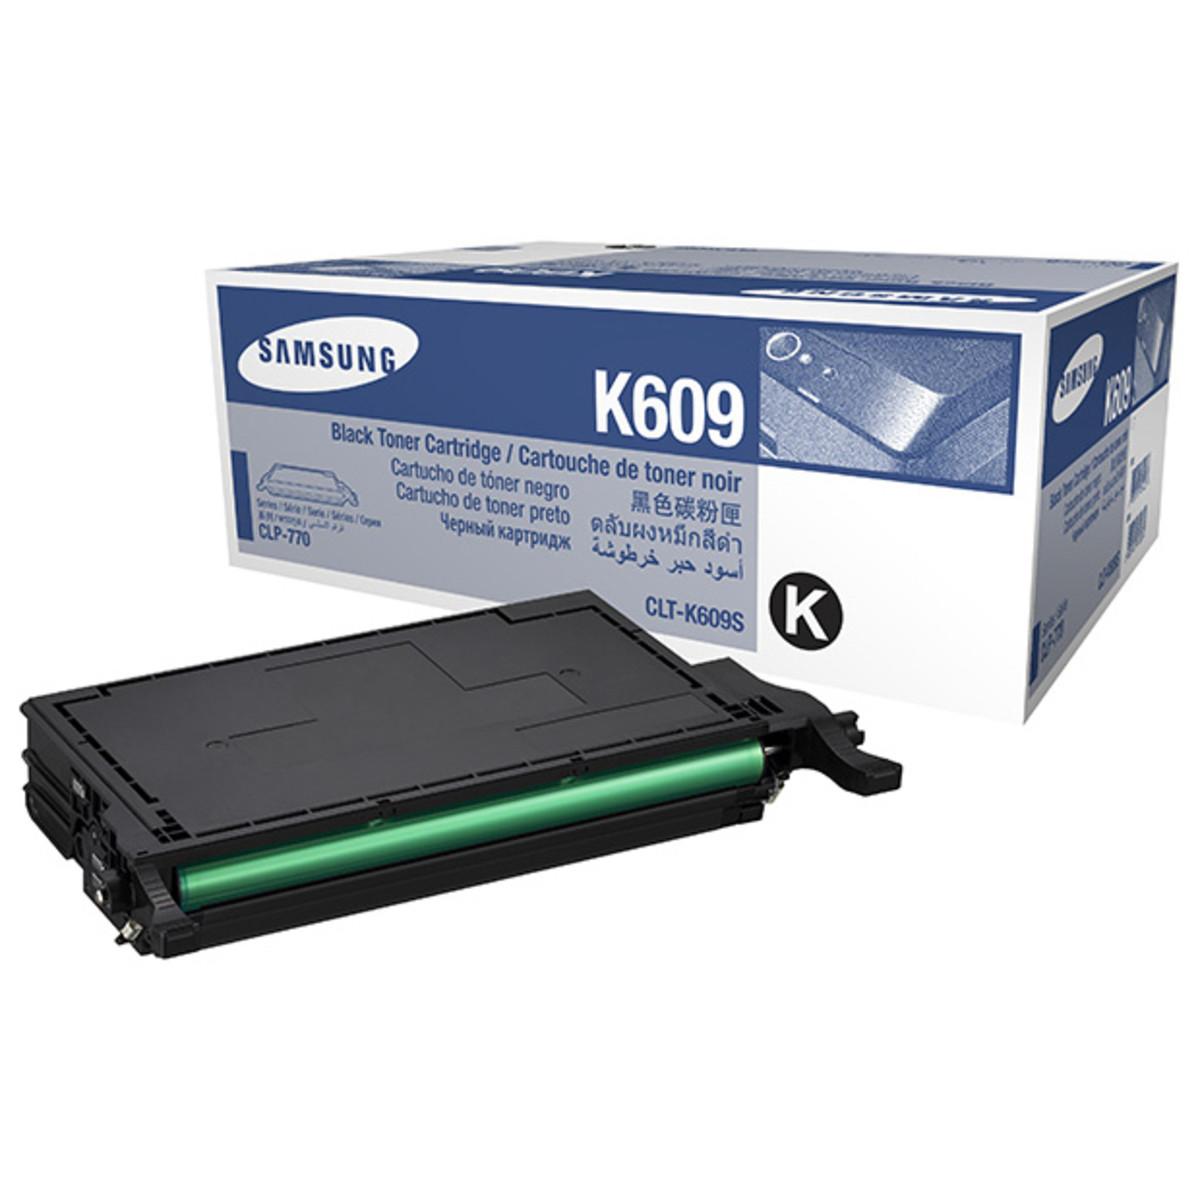 Samsung CLT-K609S Black Toner Cartridge